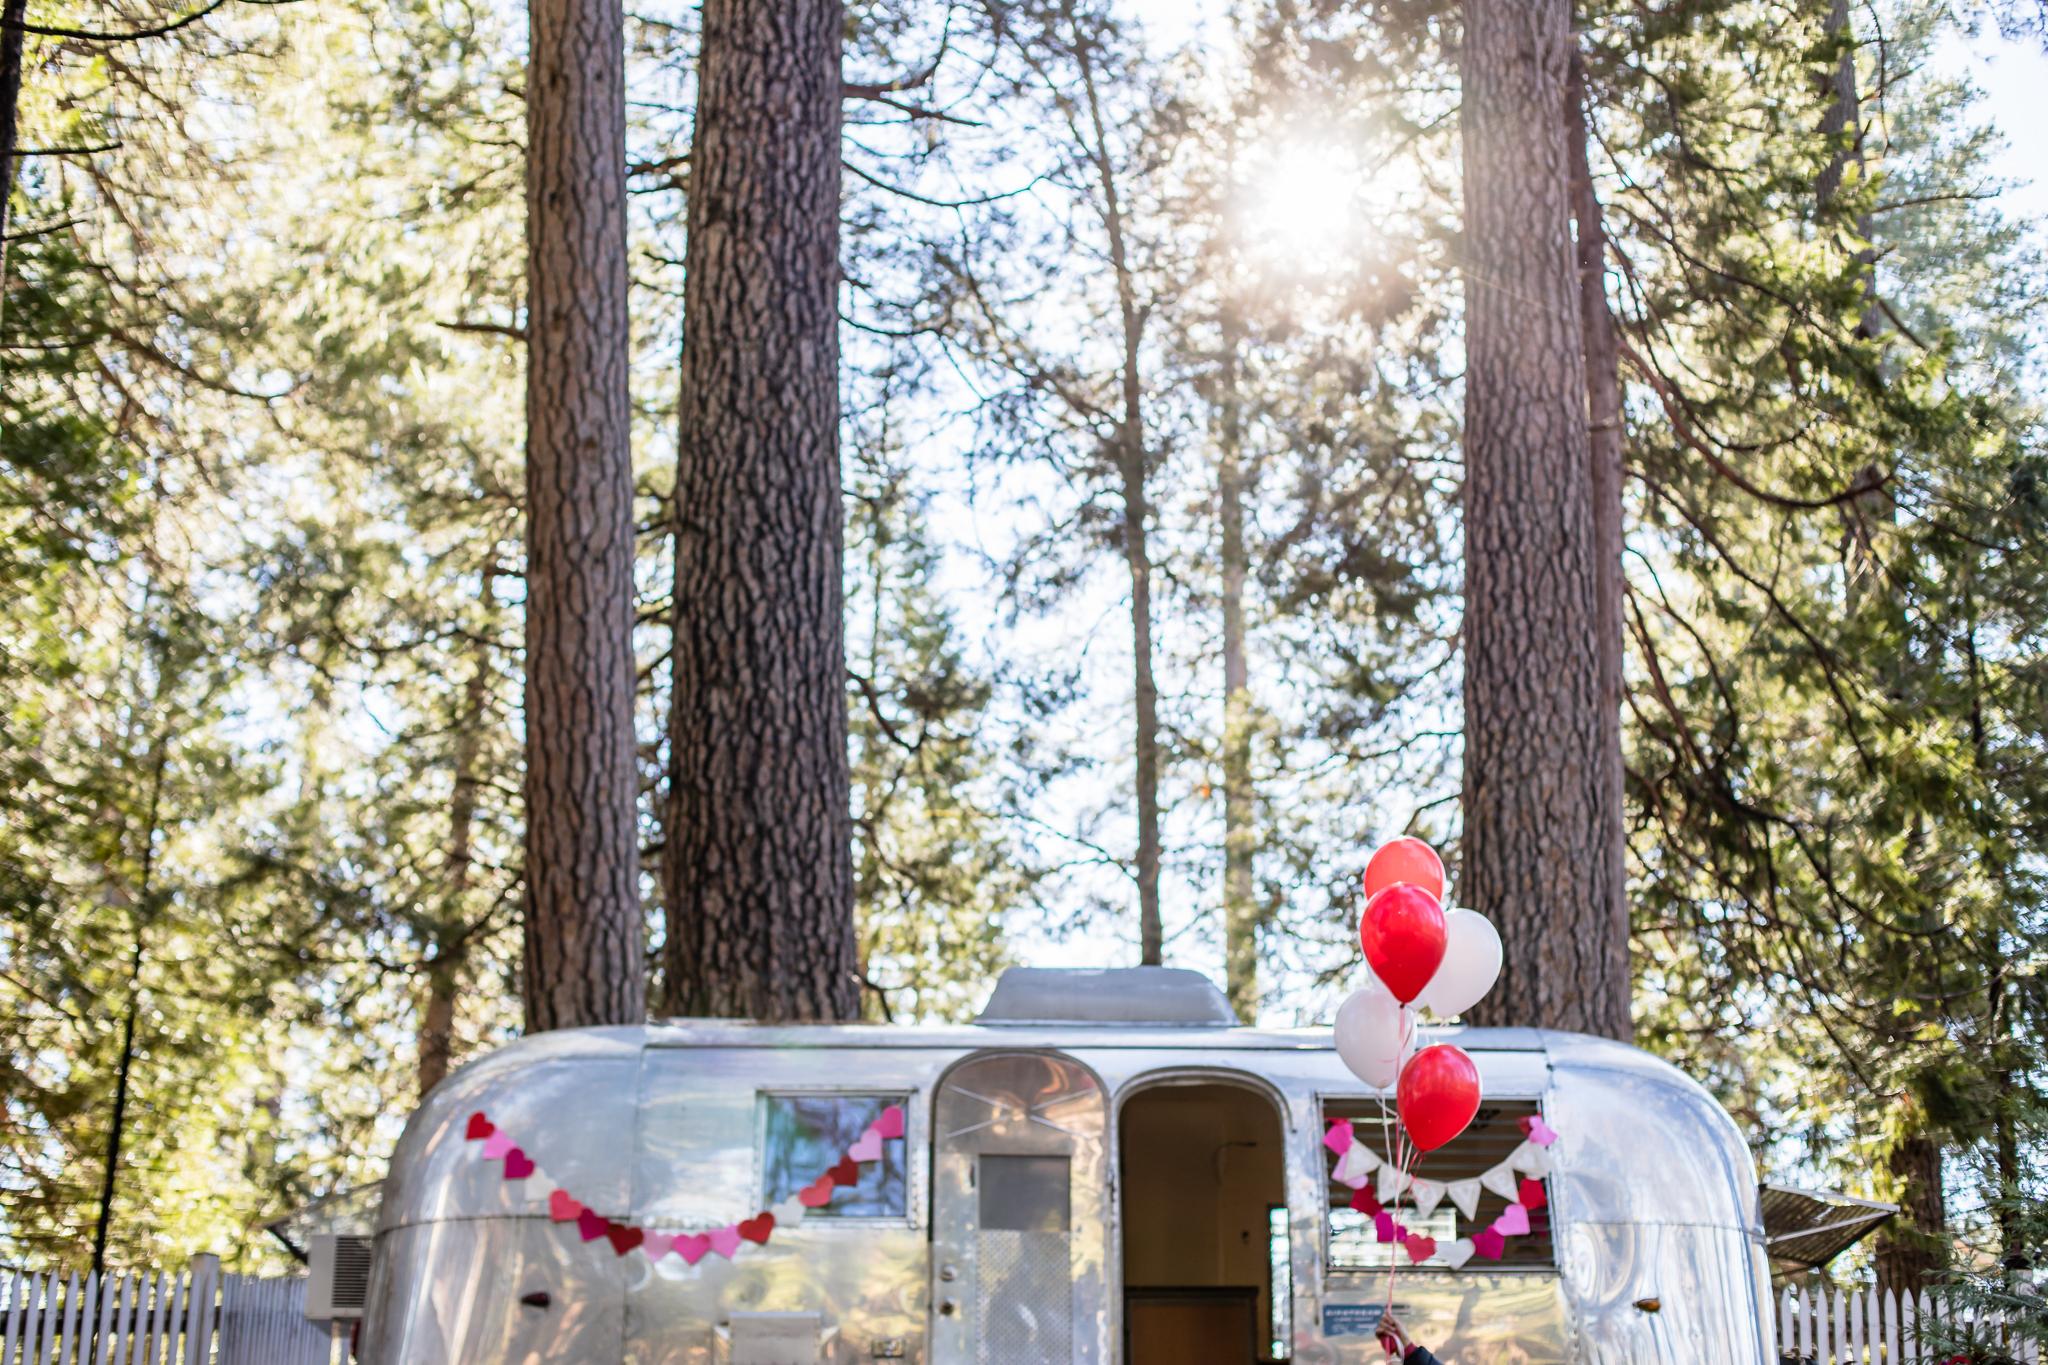 Inn Town Campground Valentine's Day Decorating | Lenkaland Photo